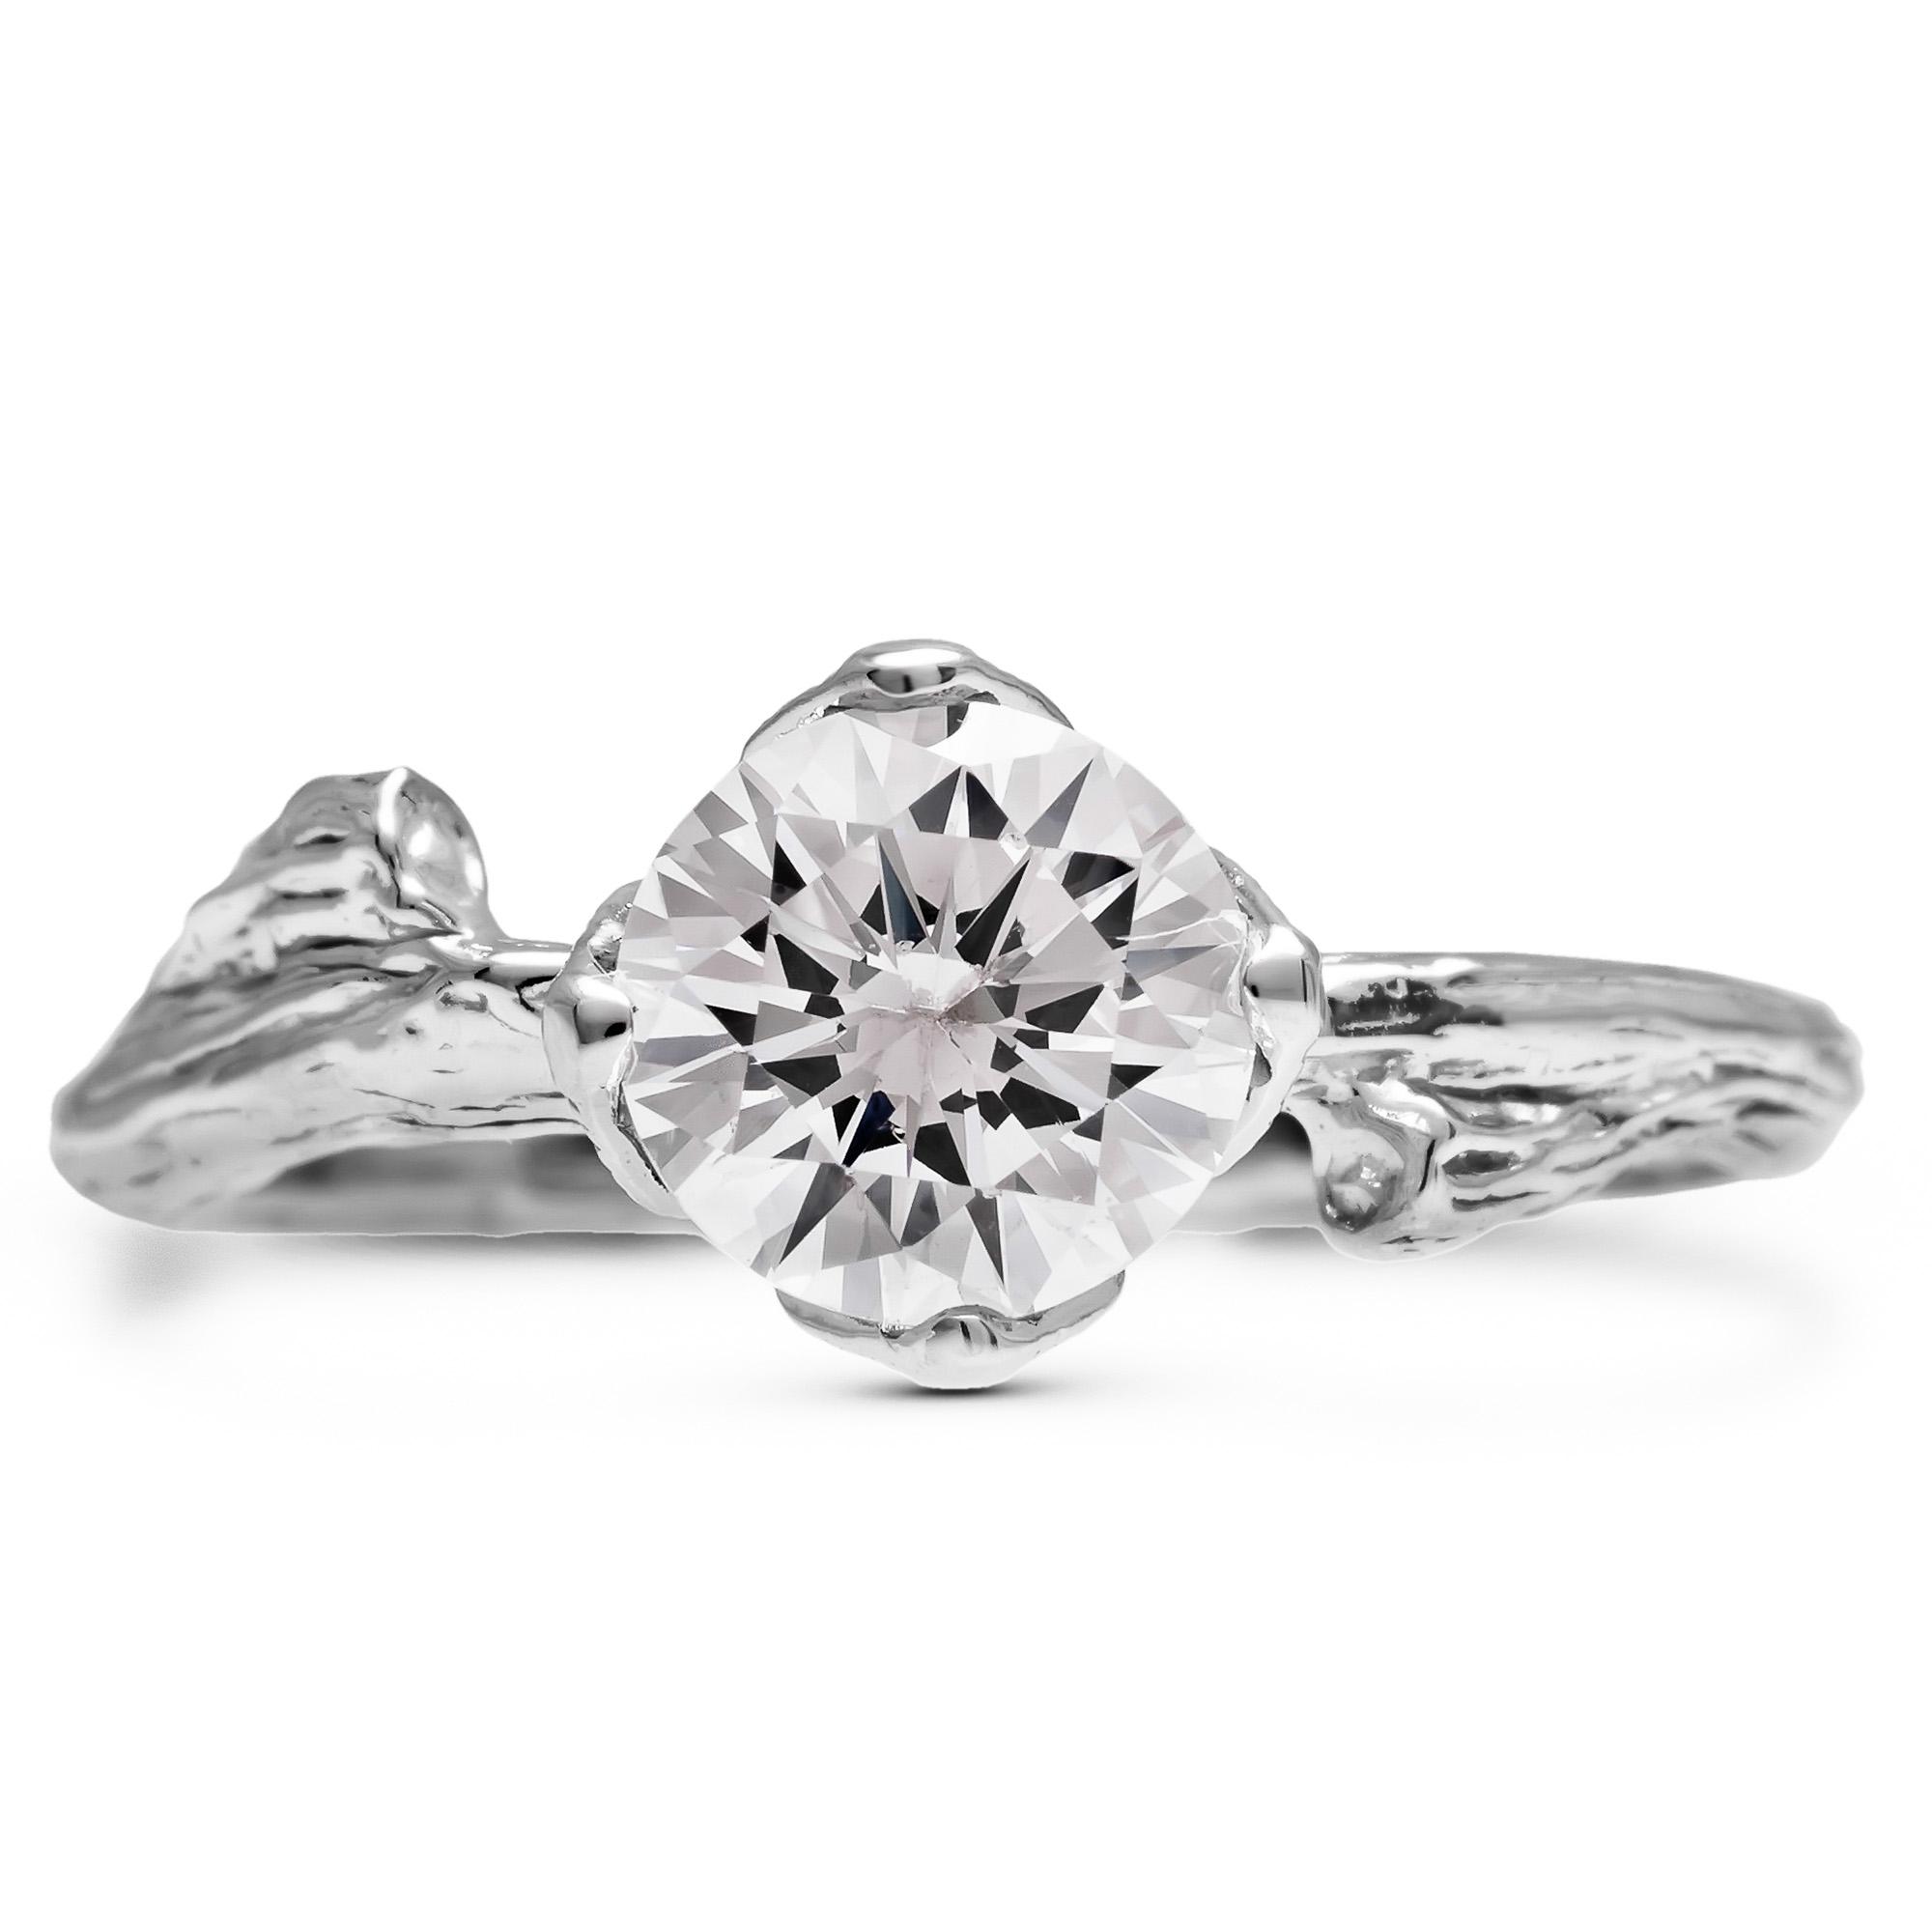 Moissanite Alternative Engagement Ring White Gold Branch and Leaf Ring Alternative Diamond Ring